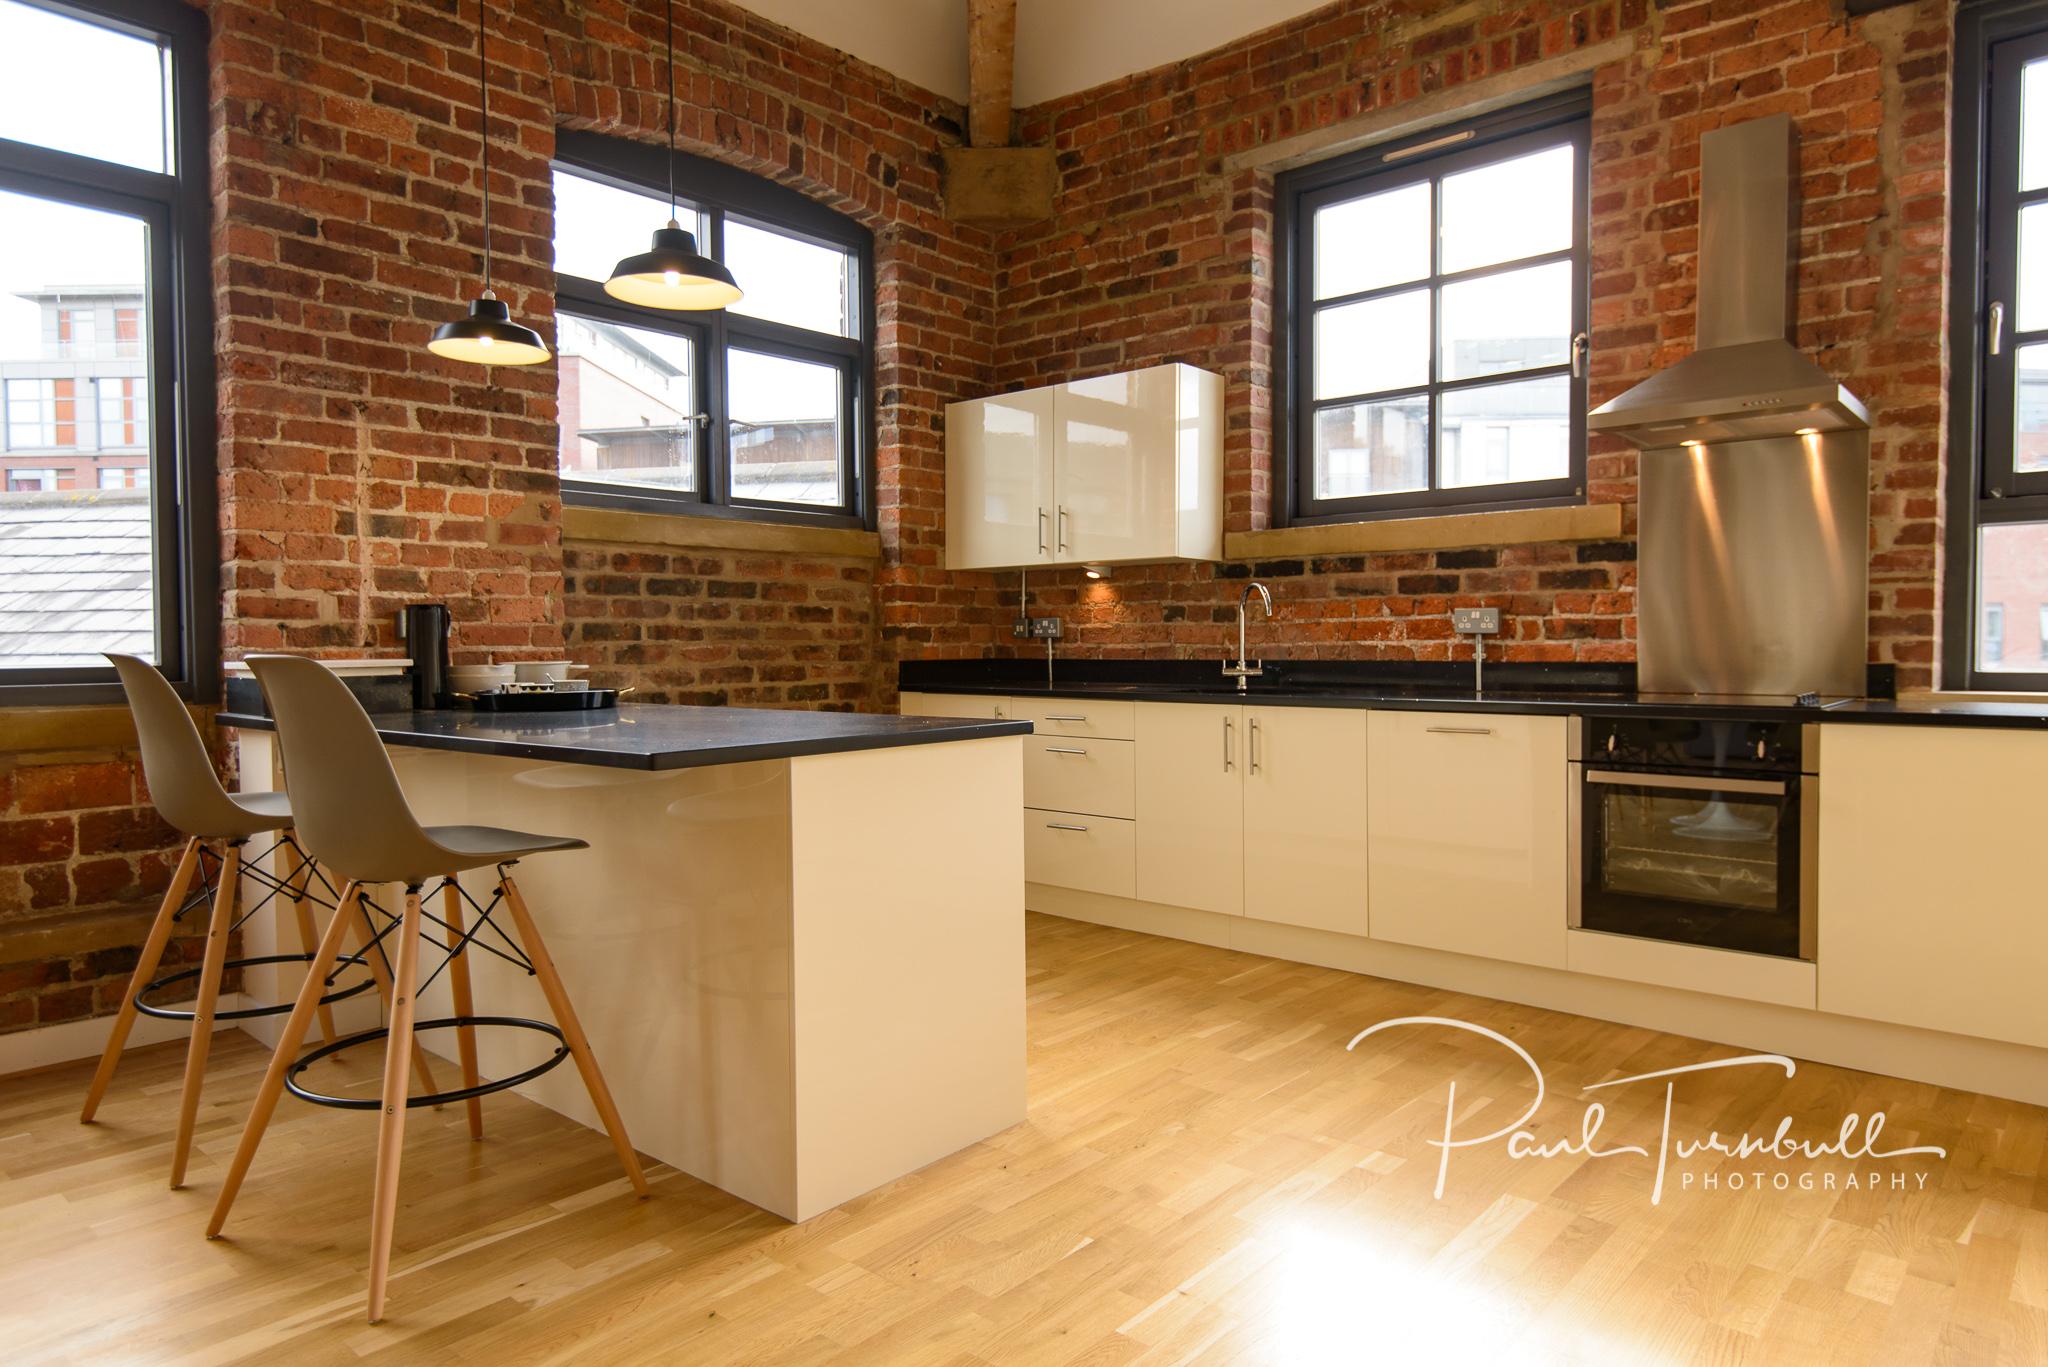 commercial-property-photographer-leeds-yorkshire-blackbrook-developments-014.jpg